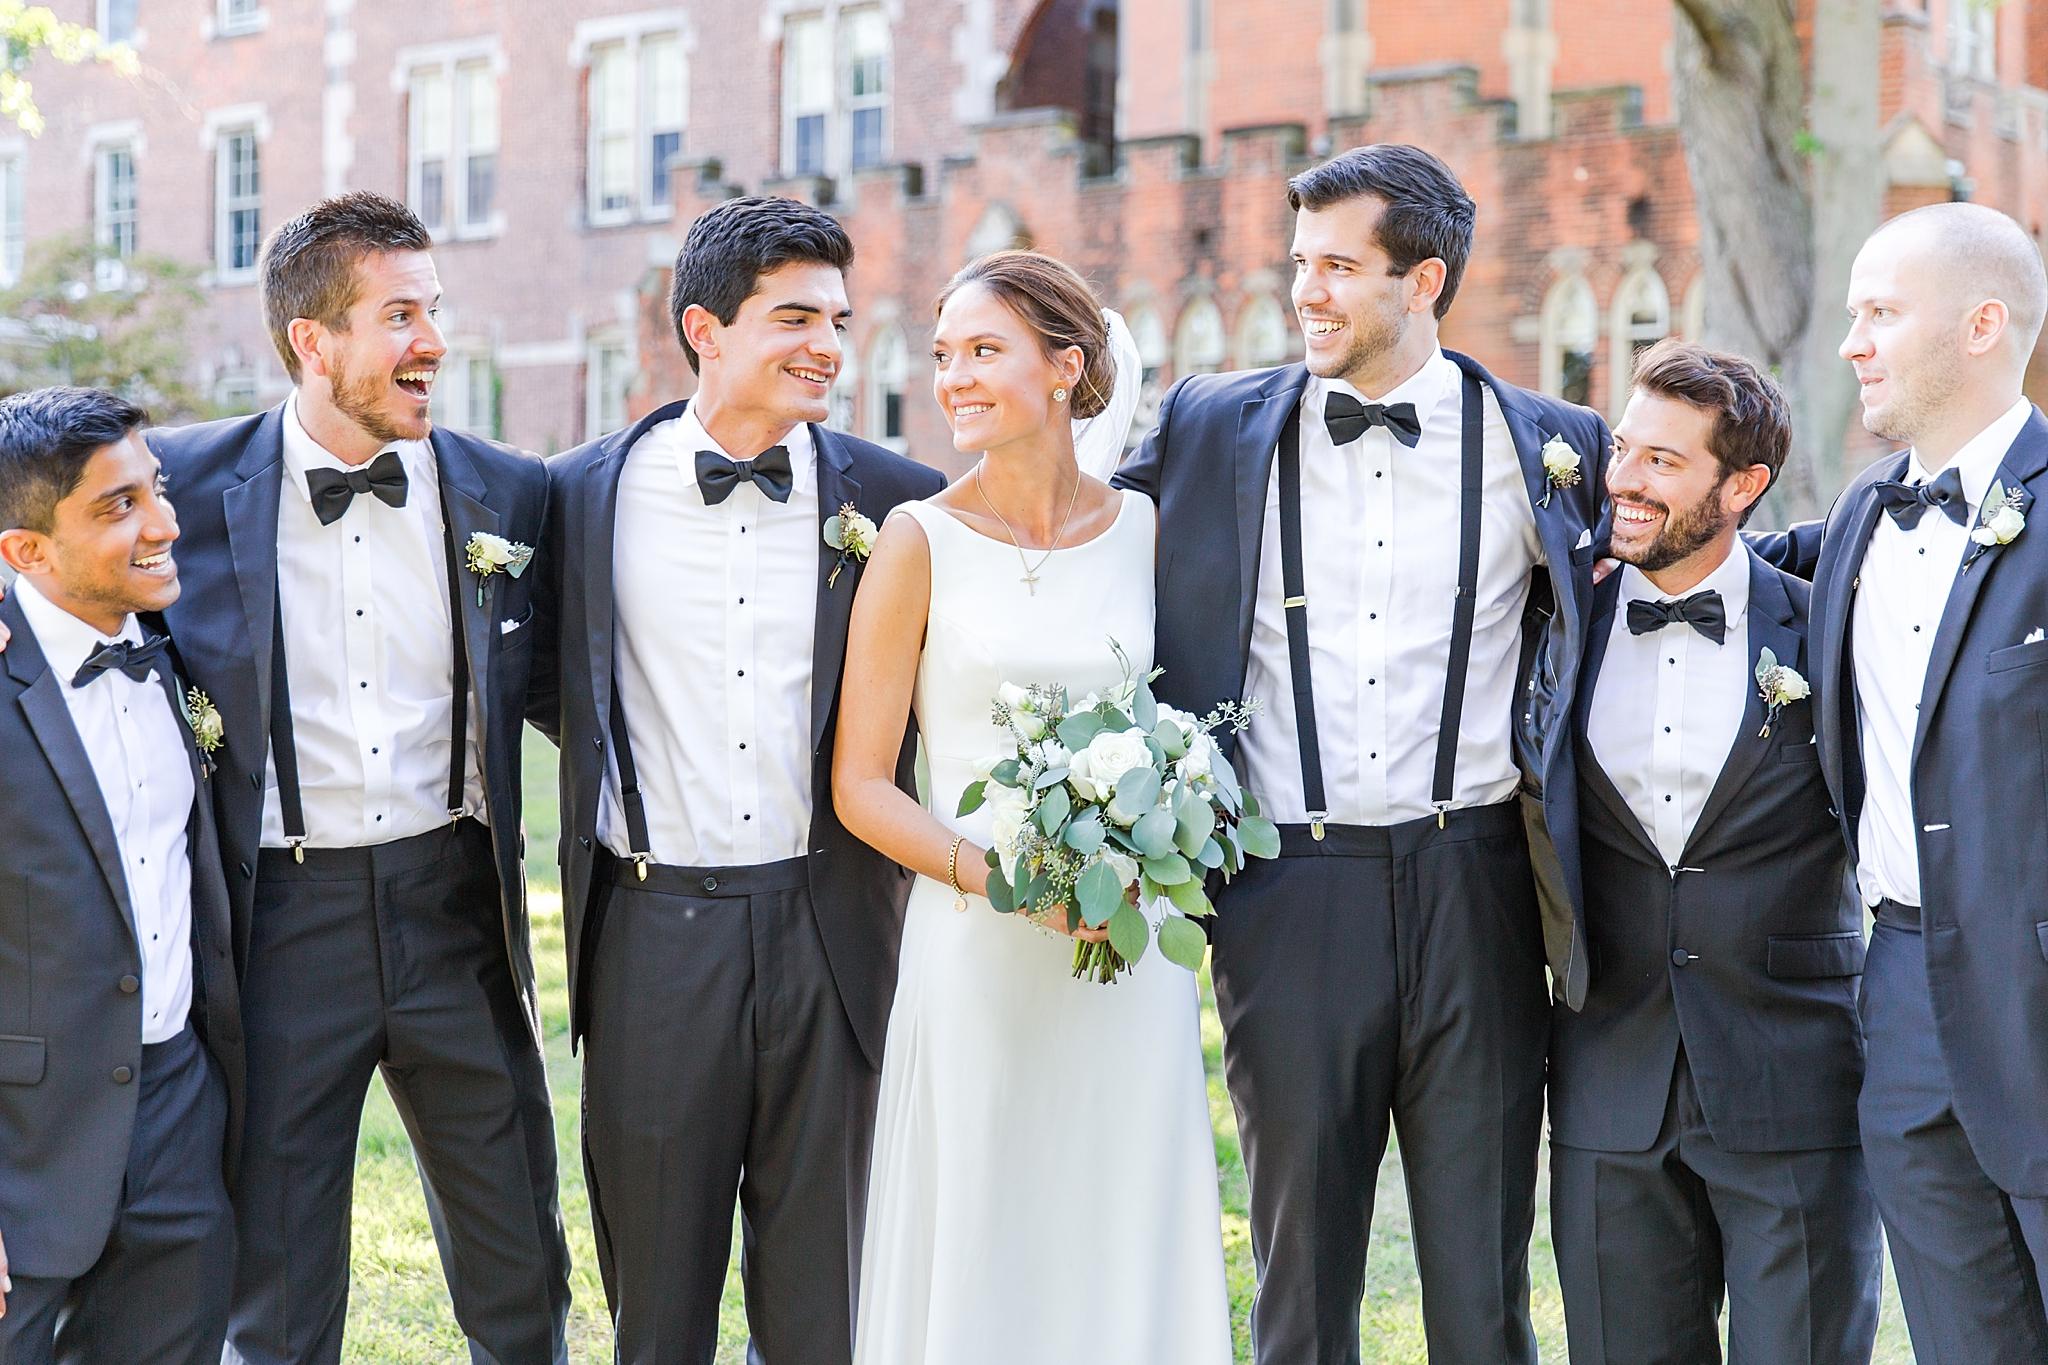 detroit-wedding-photographer-grosse-pointe-academy-chapel-detroit-golf-club-wedding-carly-matt-by-courtney-carolyn-photography_0076.jpg